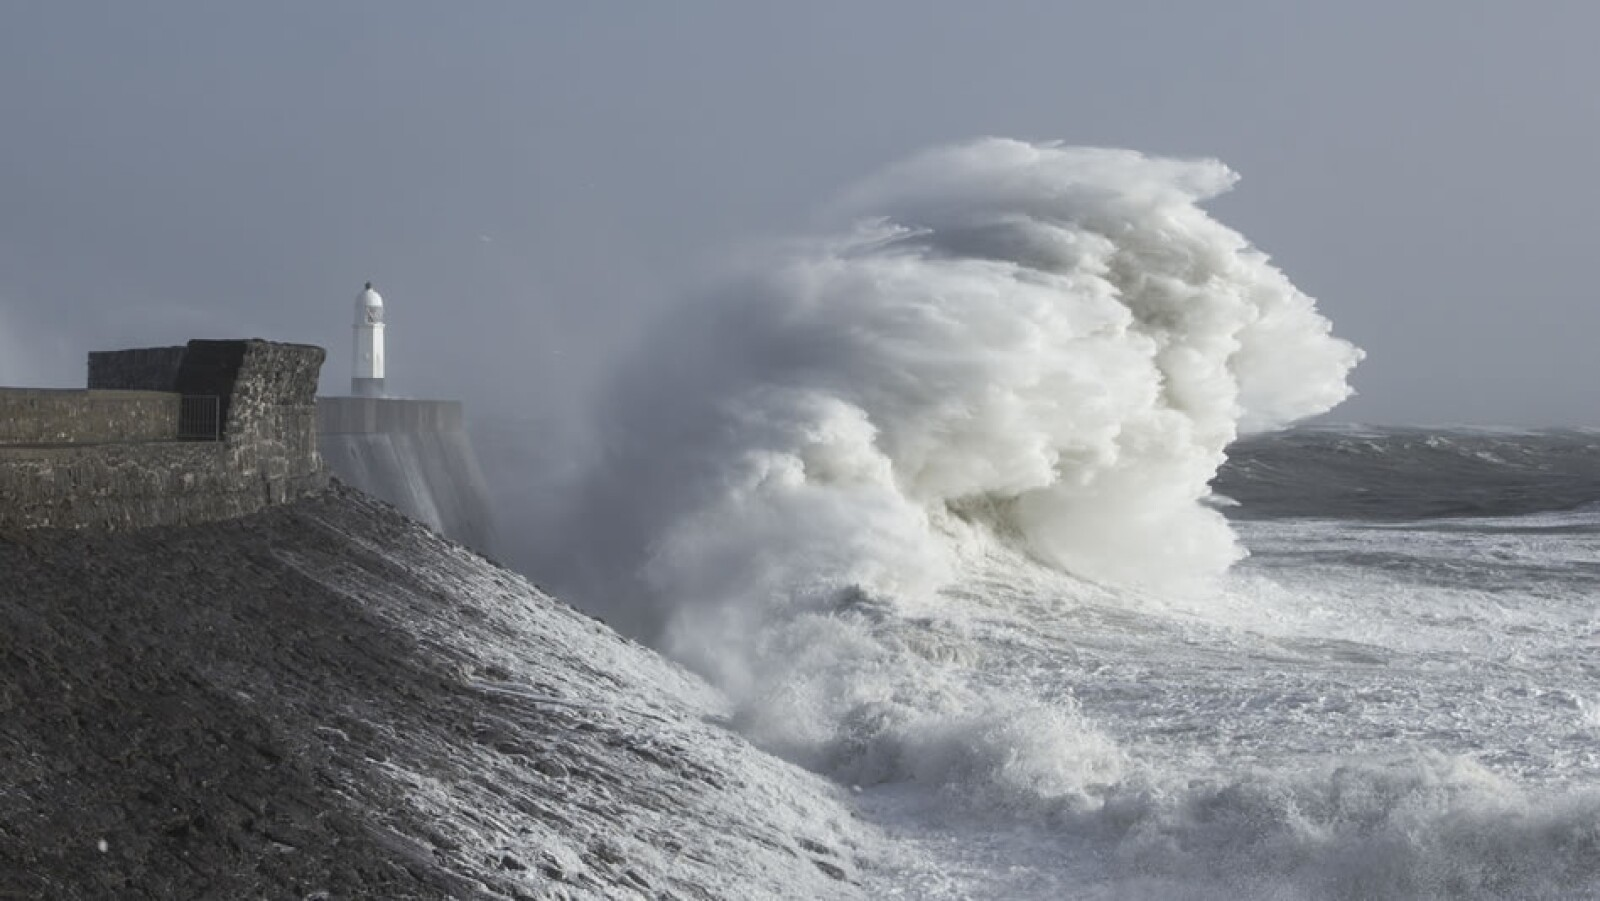 porthcawl, gales